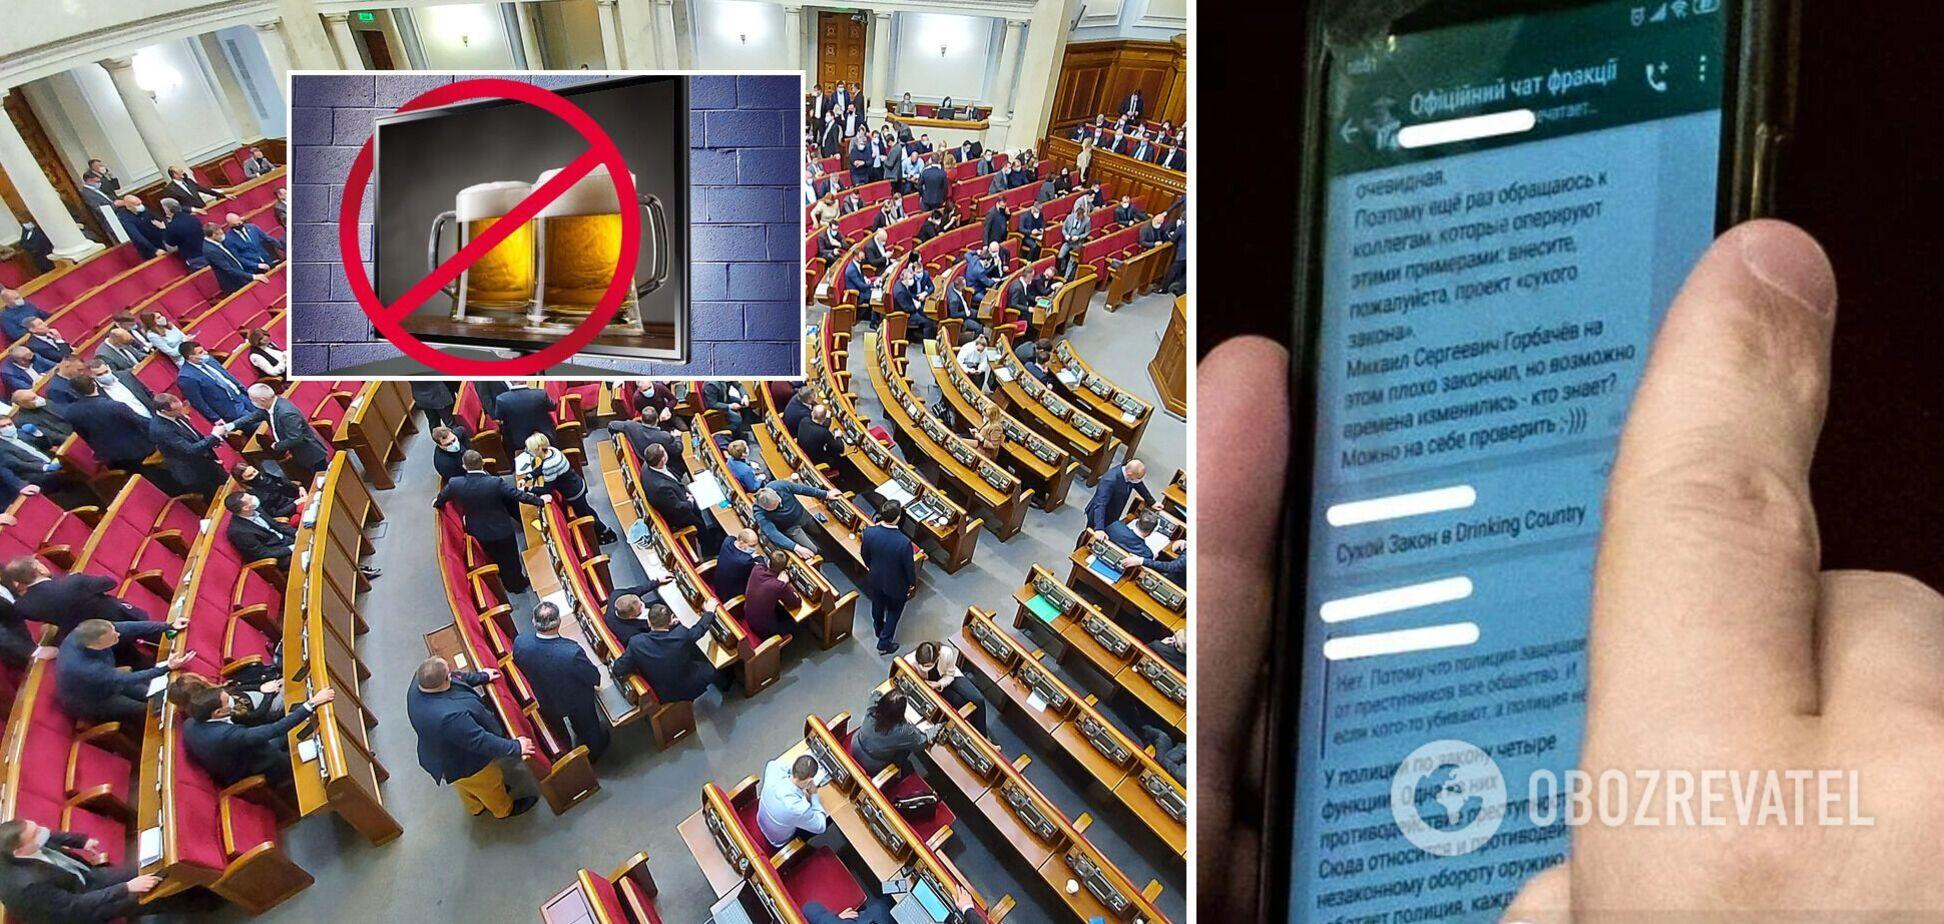 'Слуги' в чате предложили ввести сухой закон в Украине. Фото